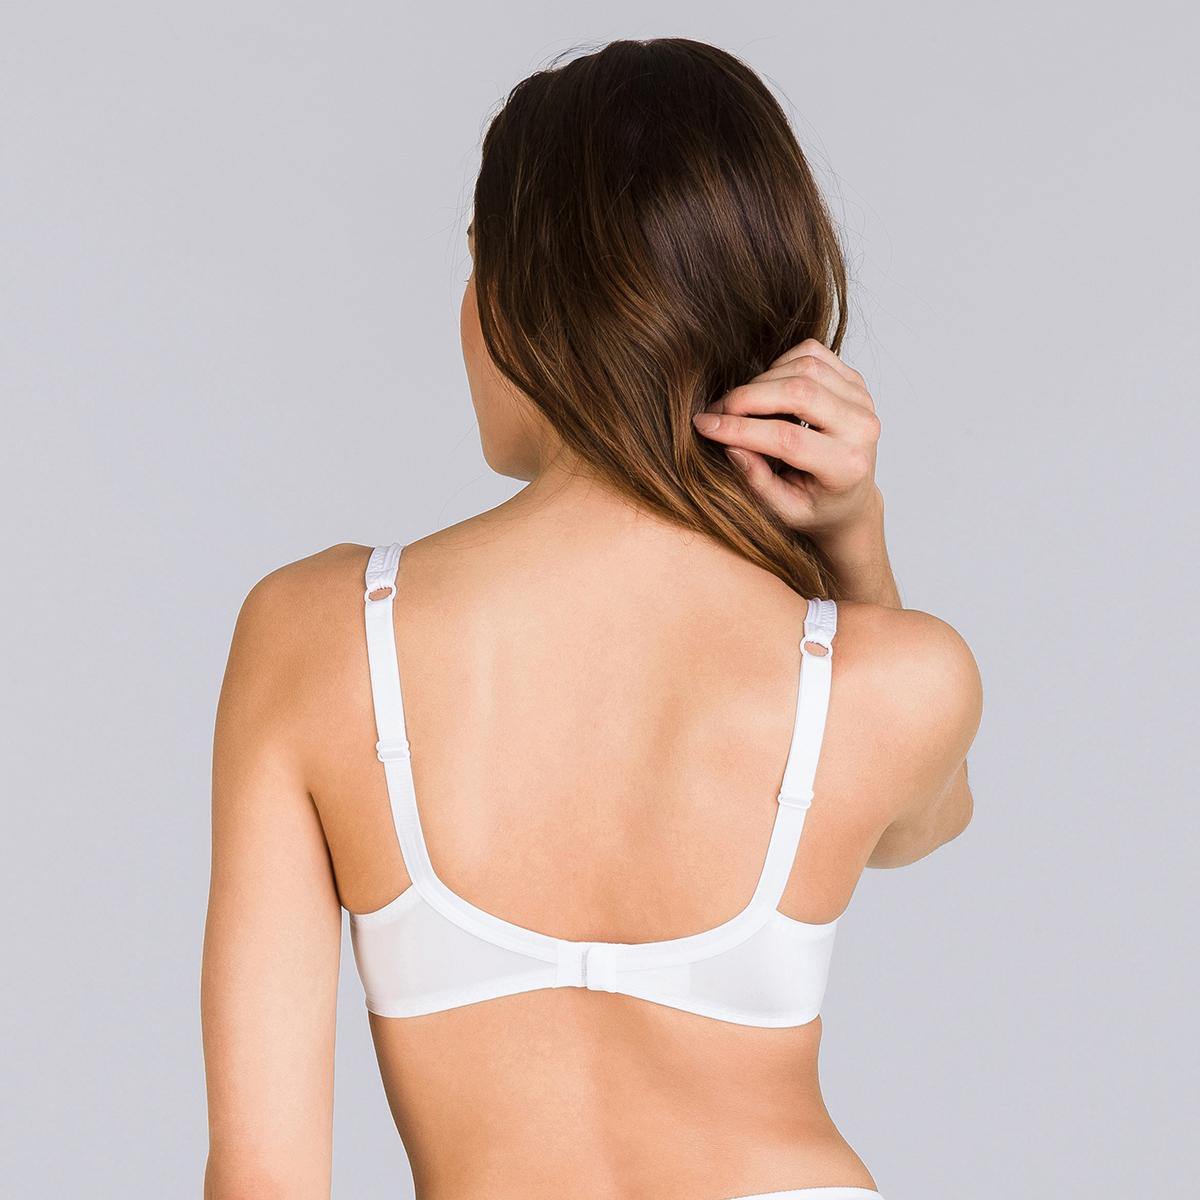 Soutien-gorge emboîtant blanc - Perfect Silhouette-PLAYTEX